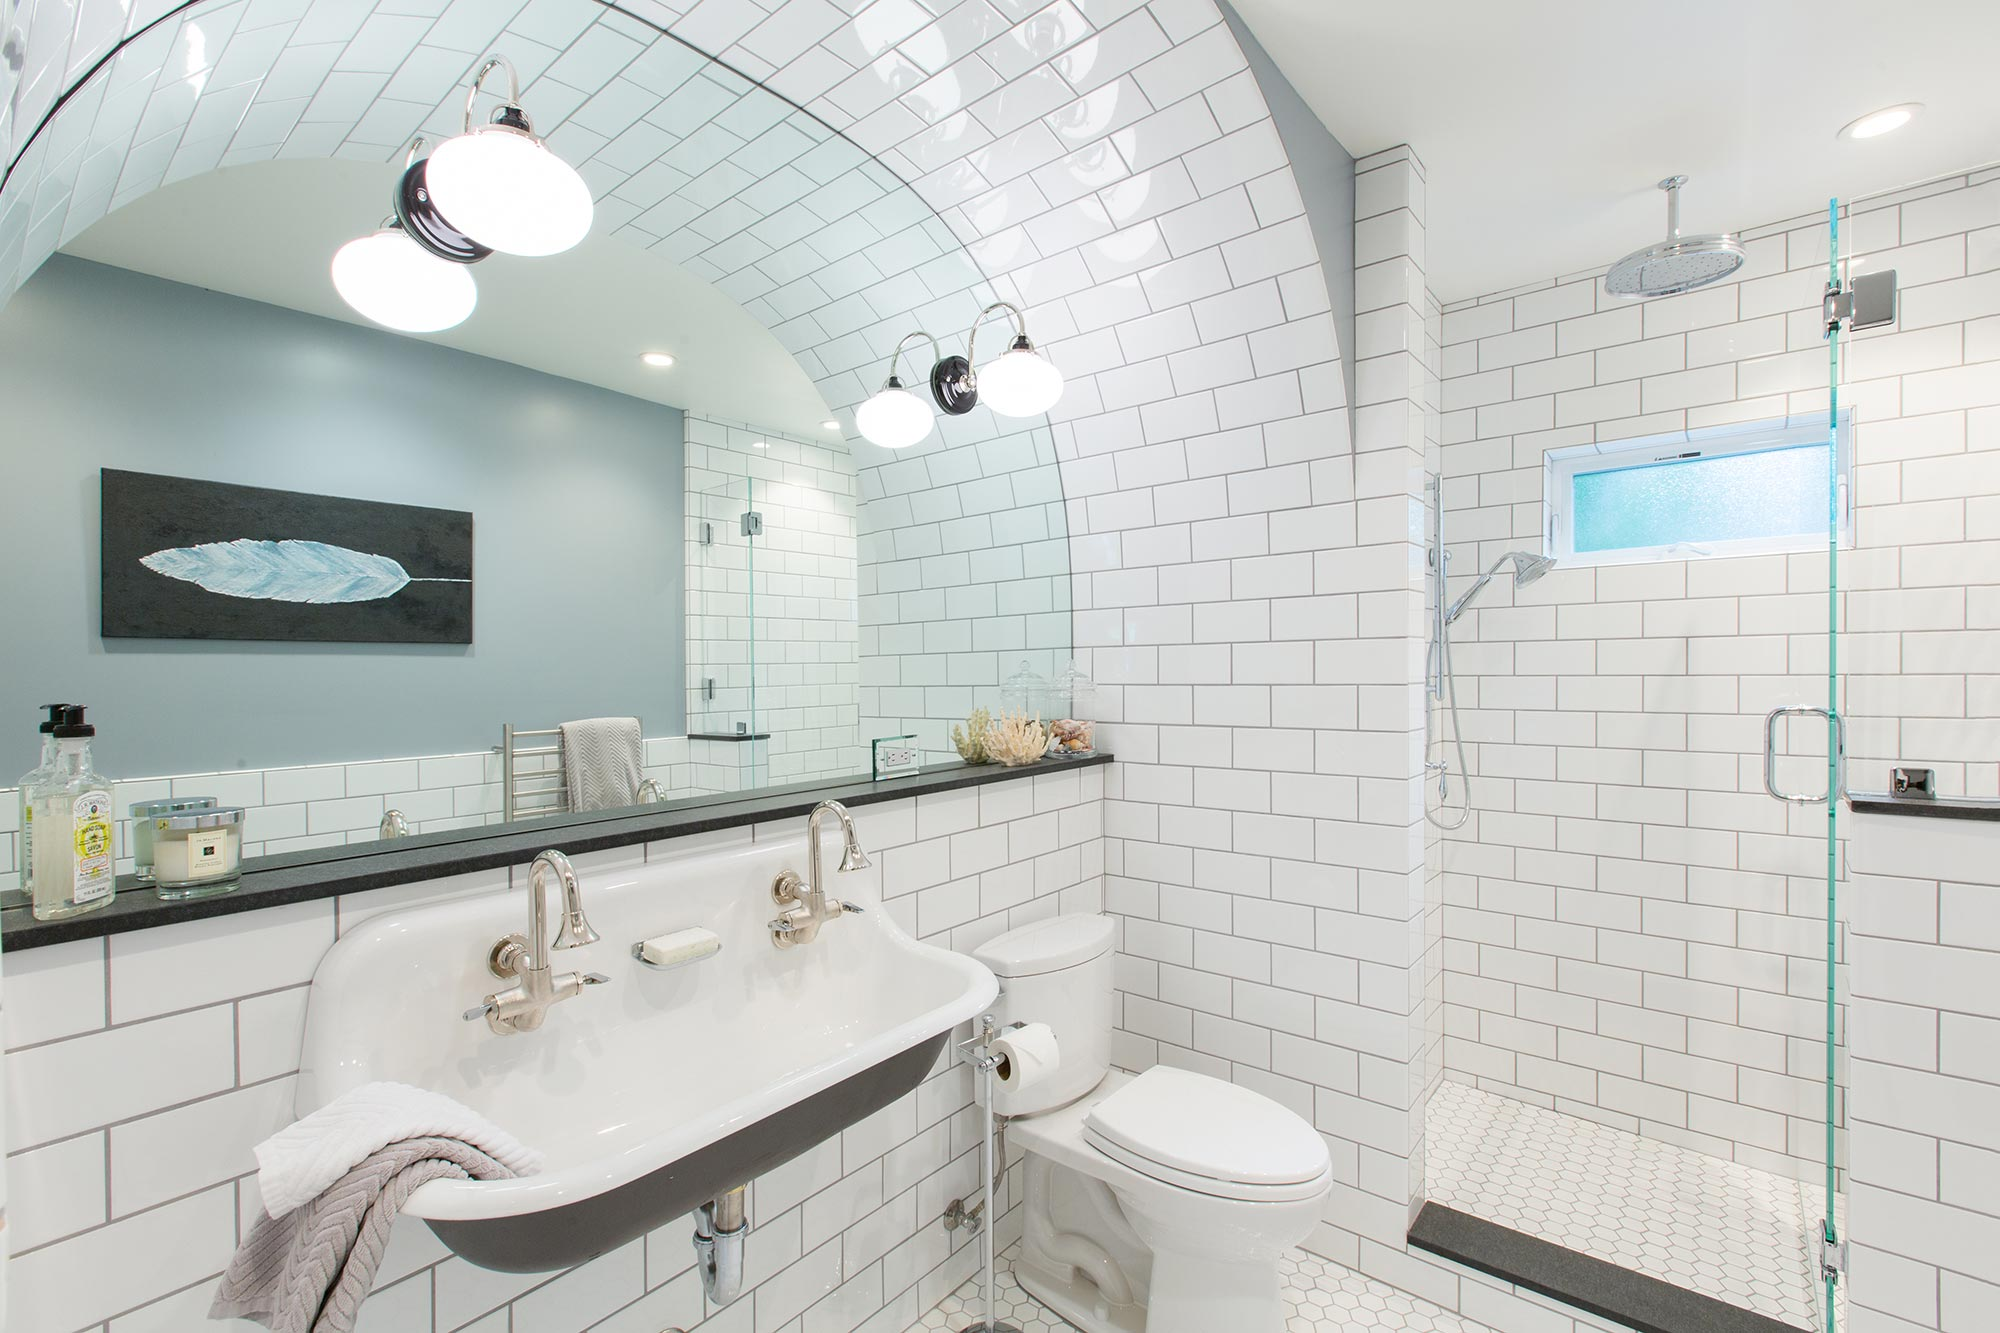 RemodelWest Rose Garden Kitchen Bathroom Remodel San Jose